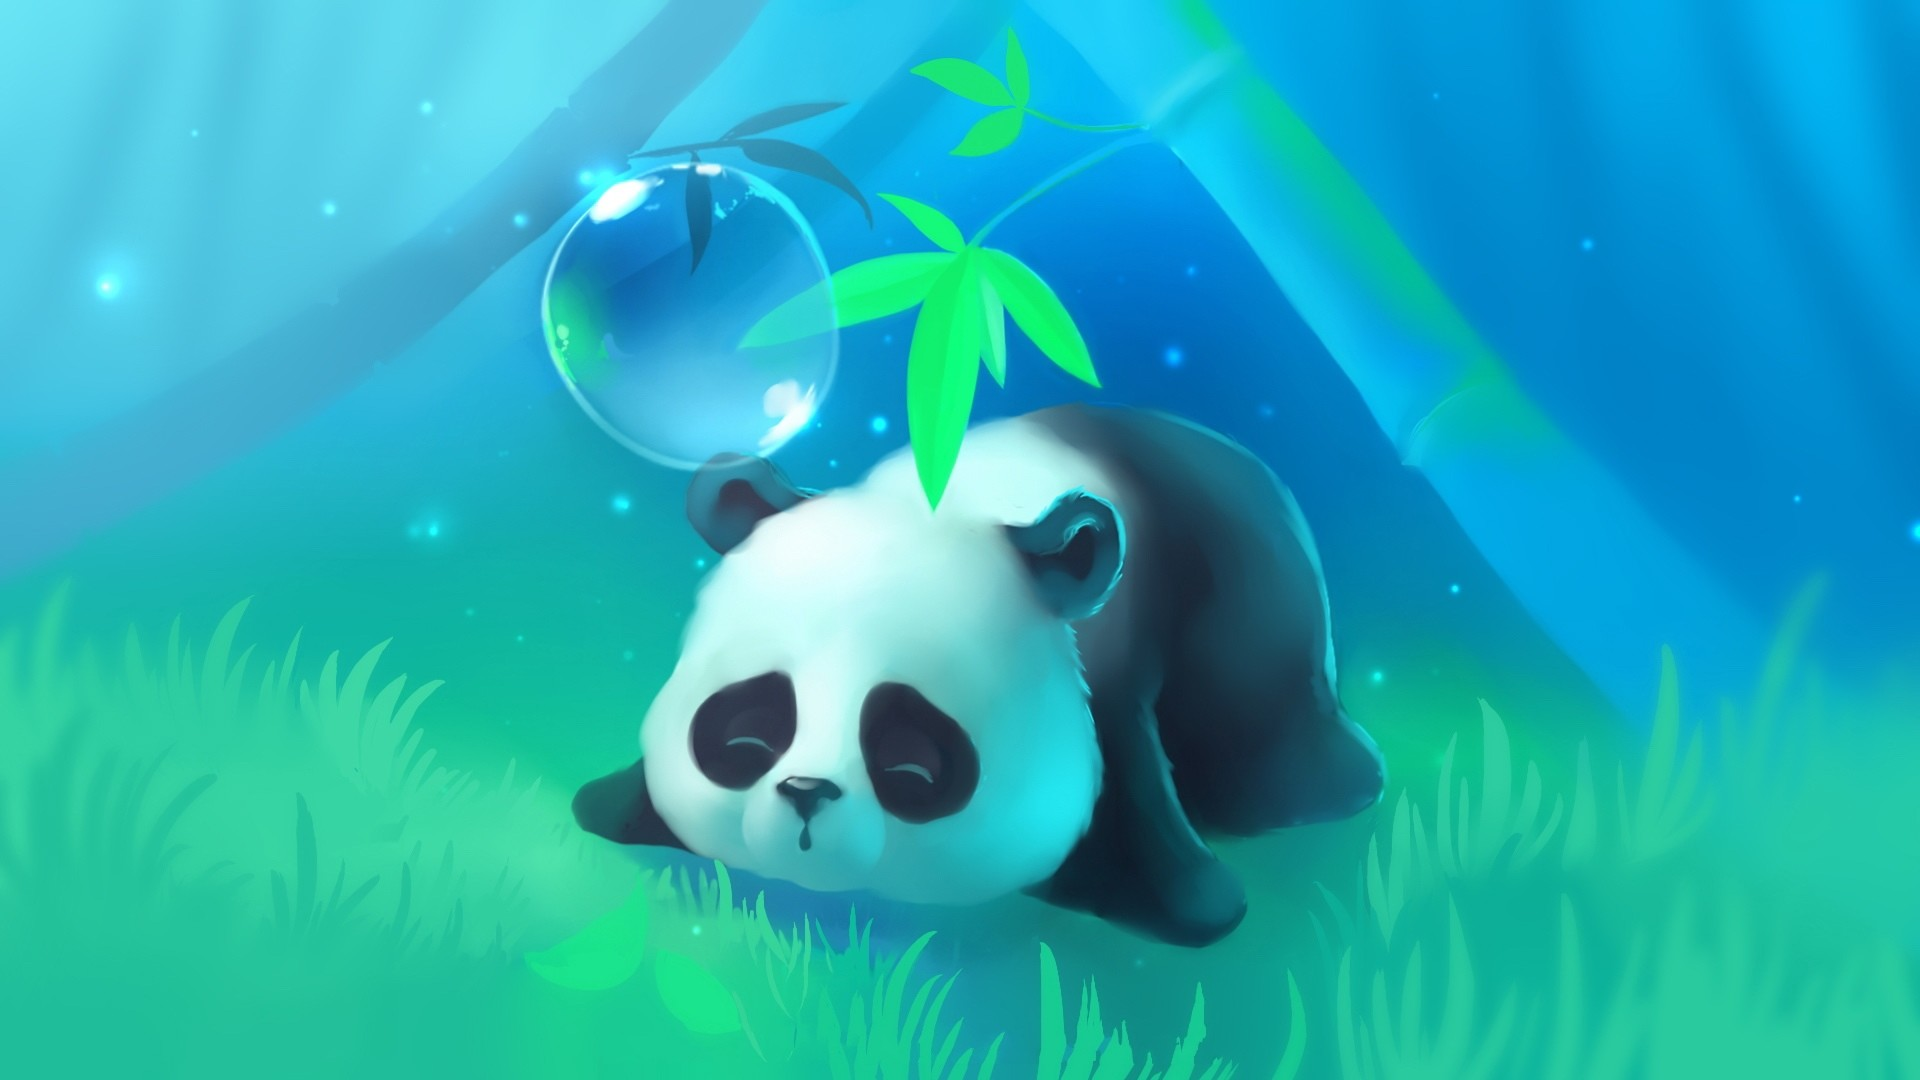 Res: 1920x1080, Best of Animated Desktop Panda Wallpaper Download - Panda Wallpapers s  Backgrounds 1024—768 Panda